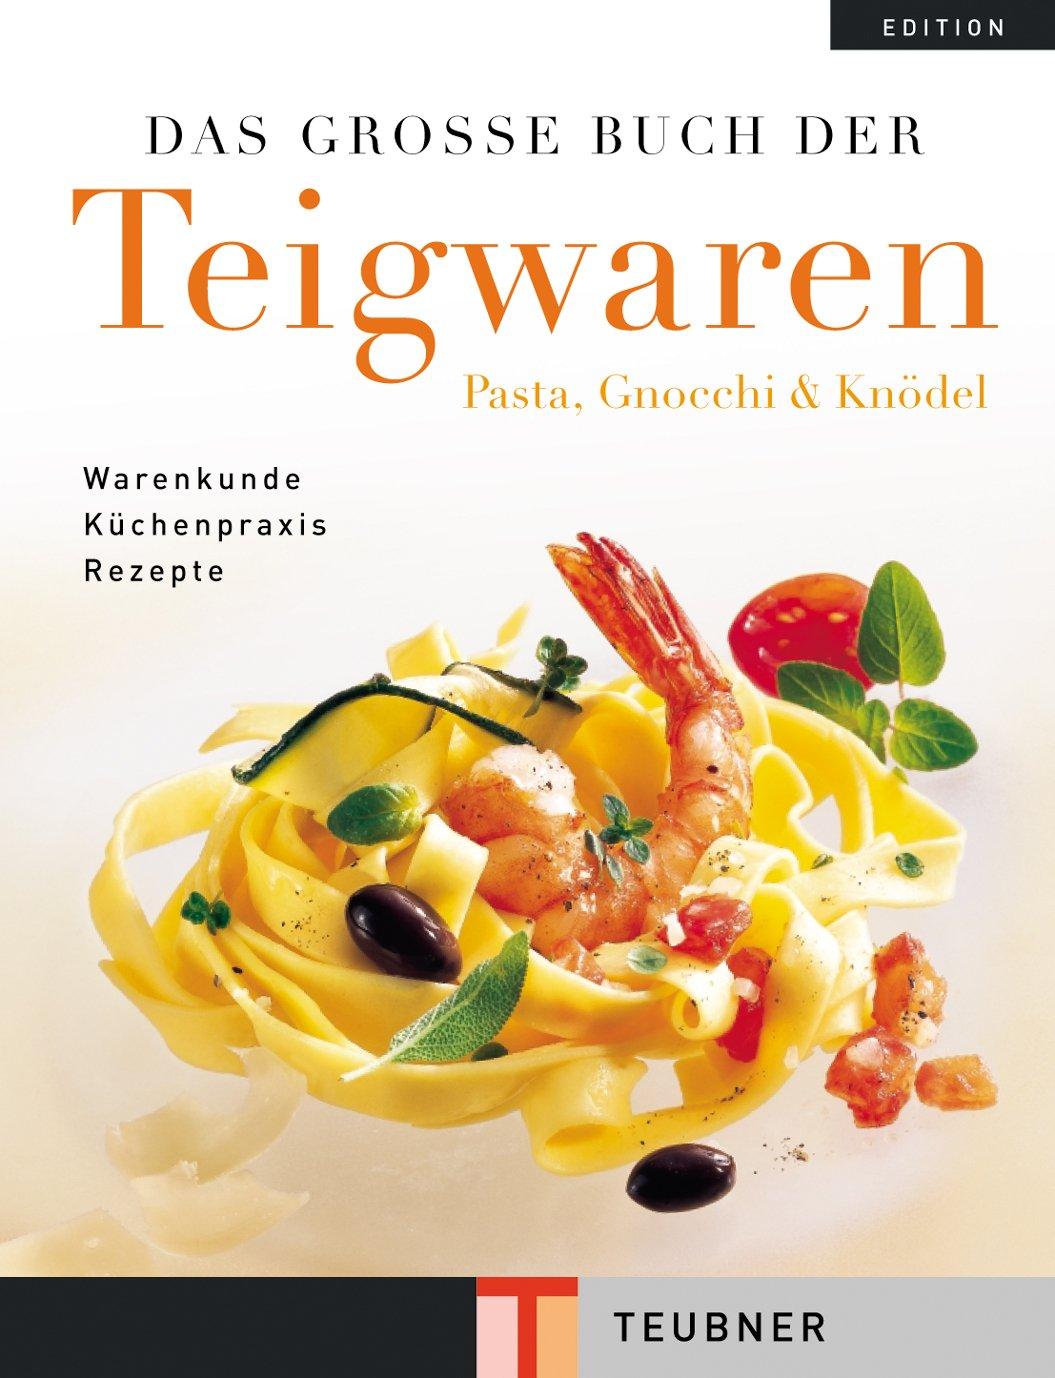 Das große Buch der Teigwaren (Teubner Edition)